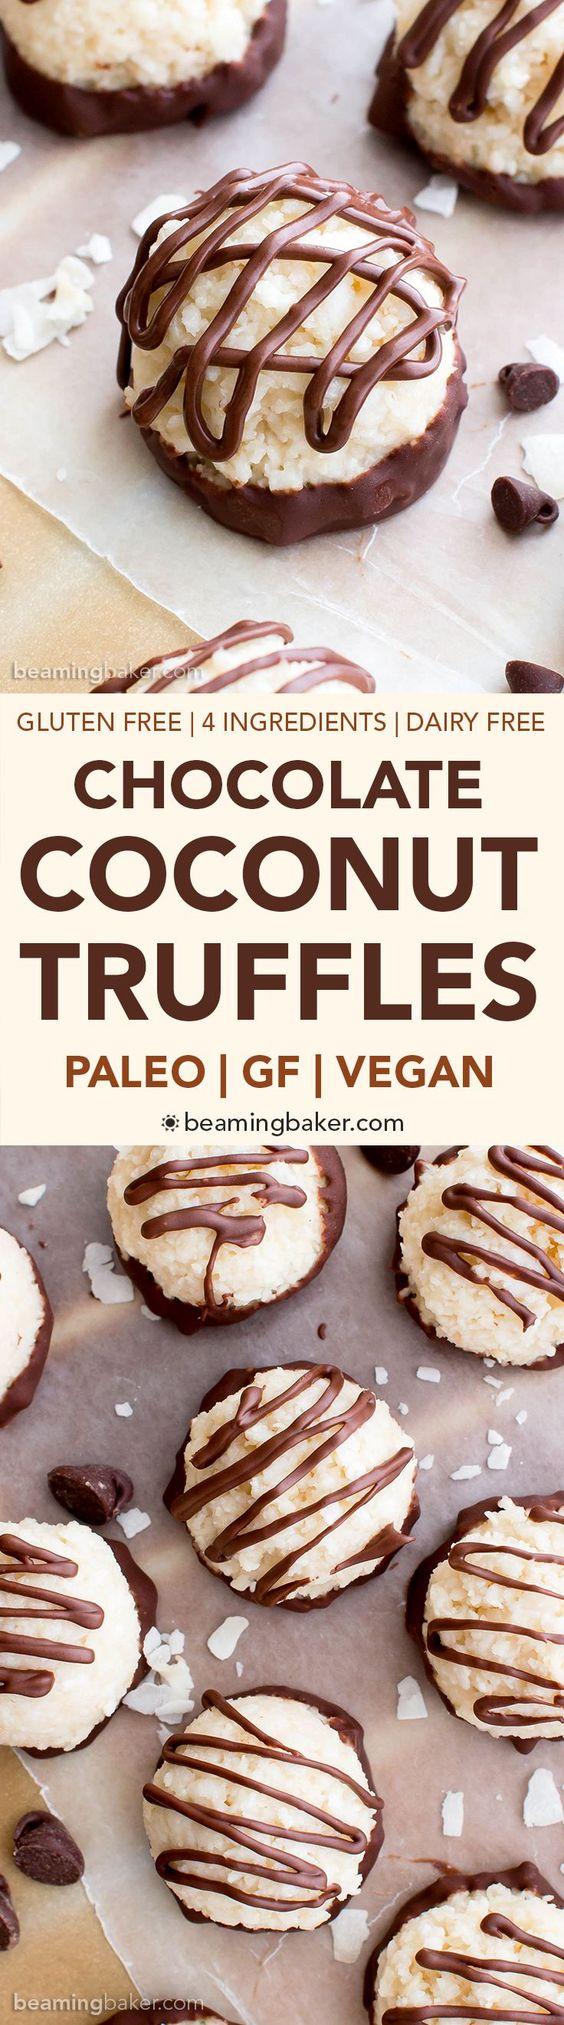 chocolate-coconut-truffles-paleo-gluten-free-vegan